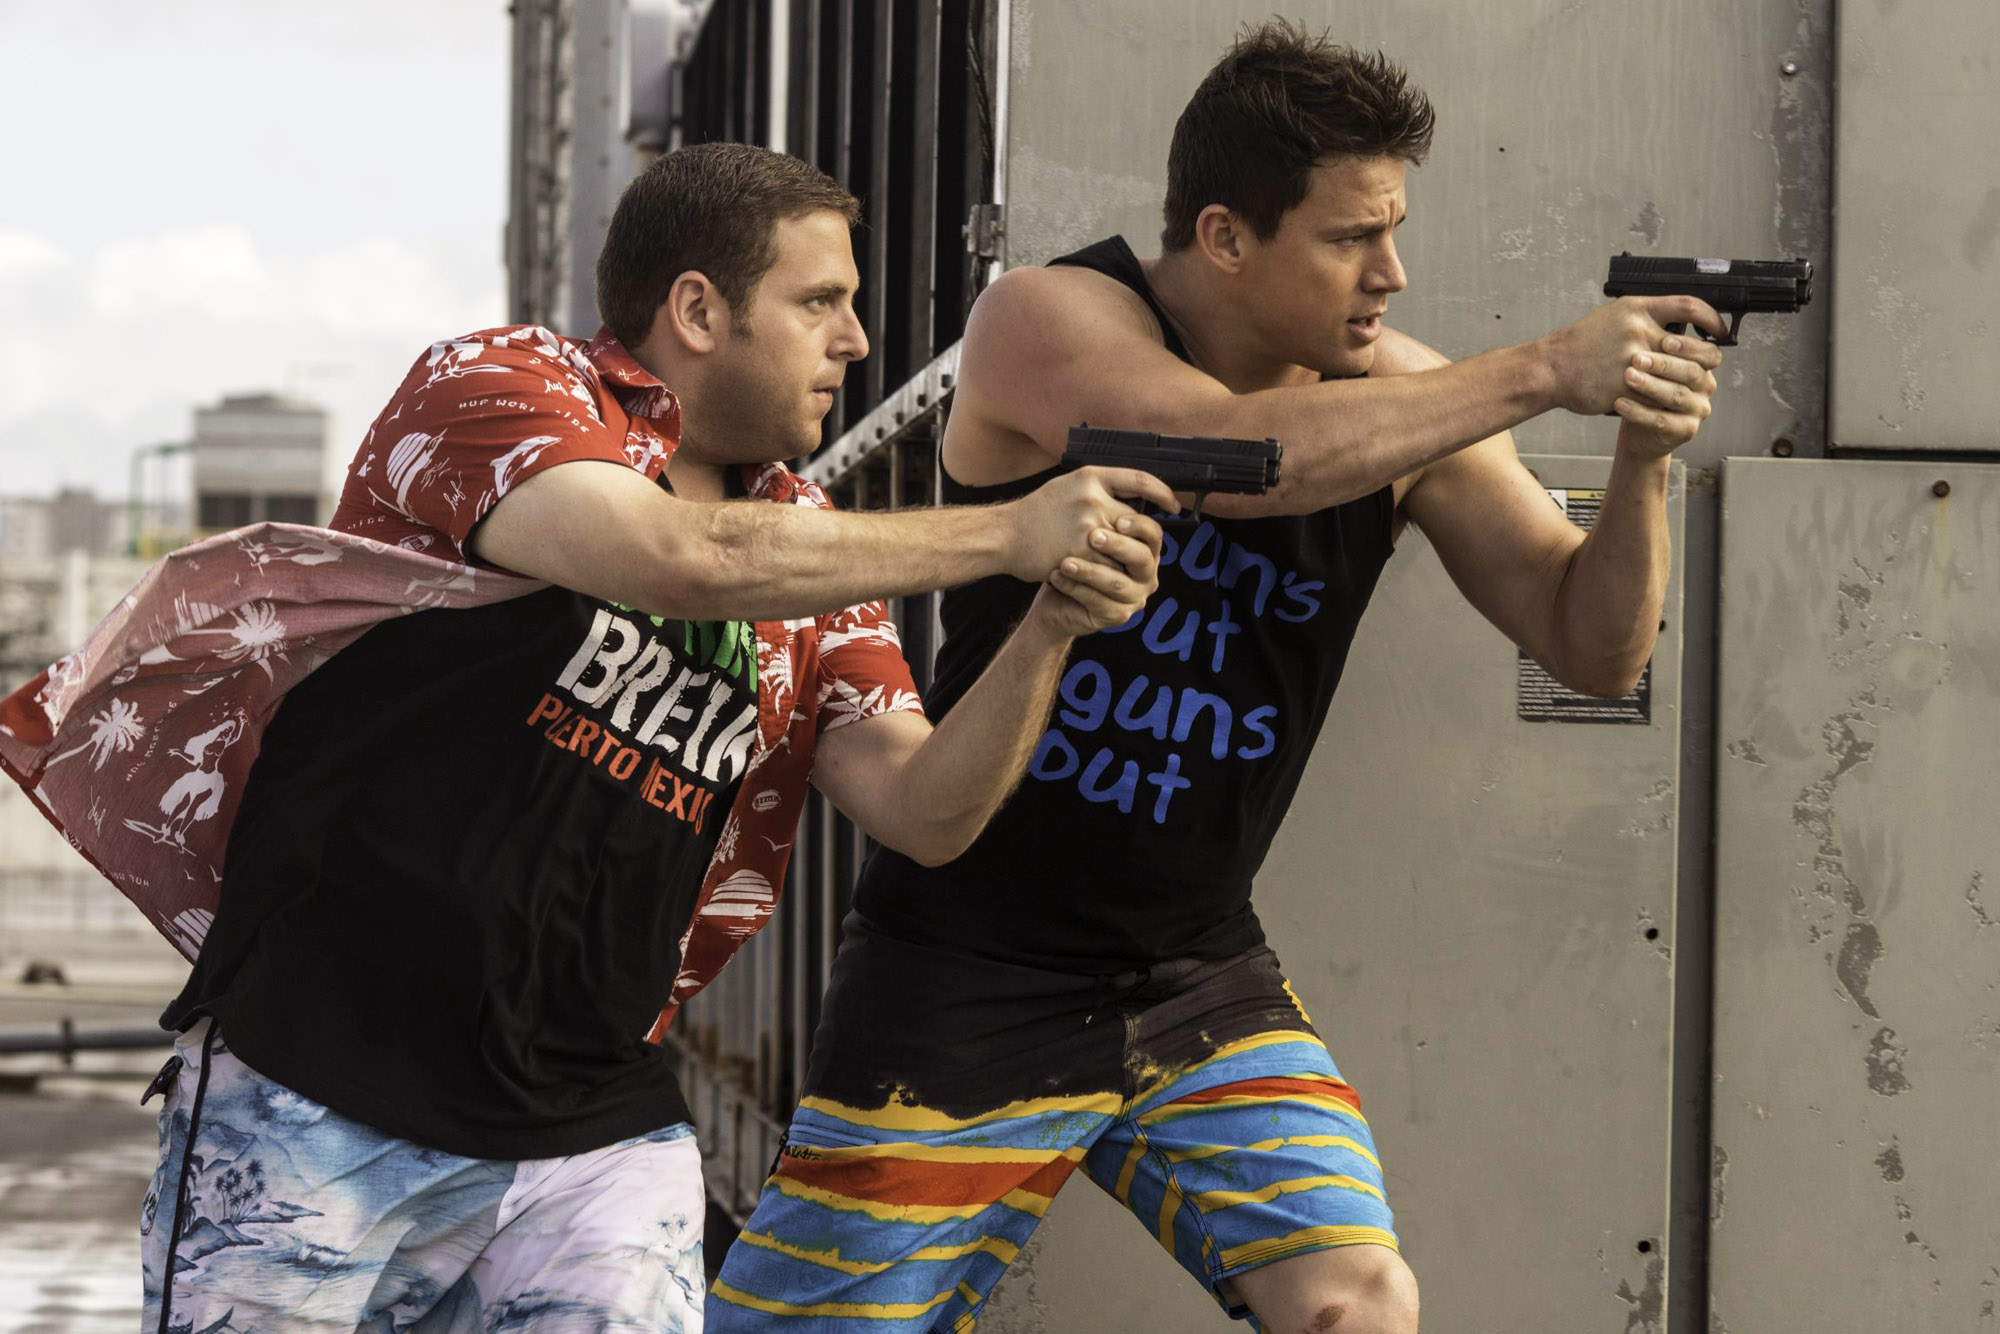 22 Jump Street: Channing Tatum e Jonah Hill poliziotti infiltrati in una scena del film